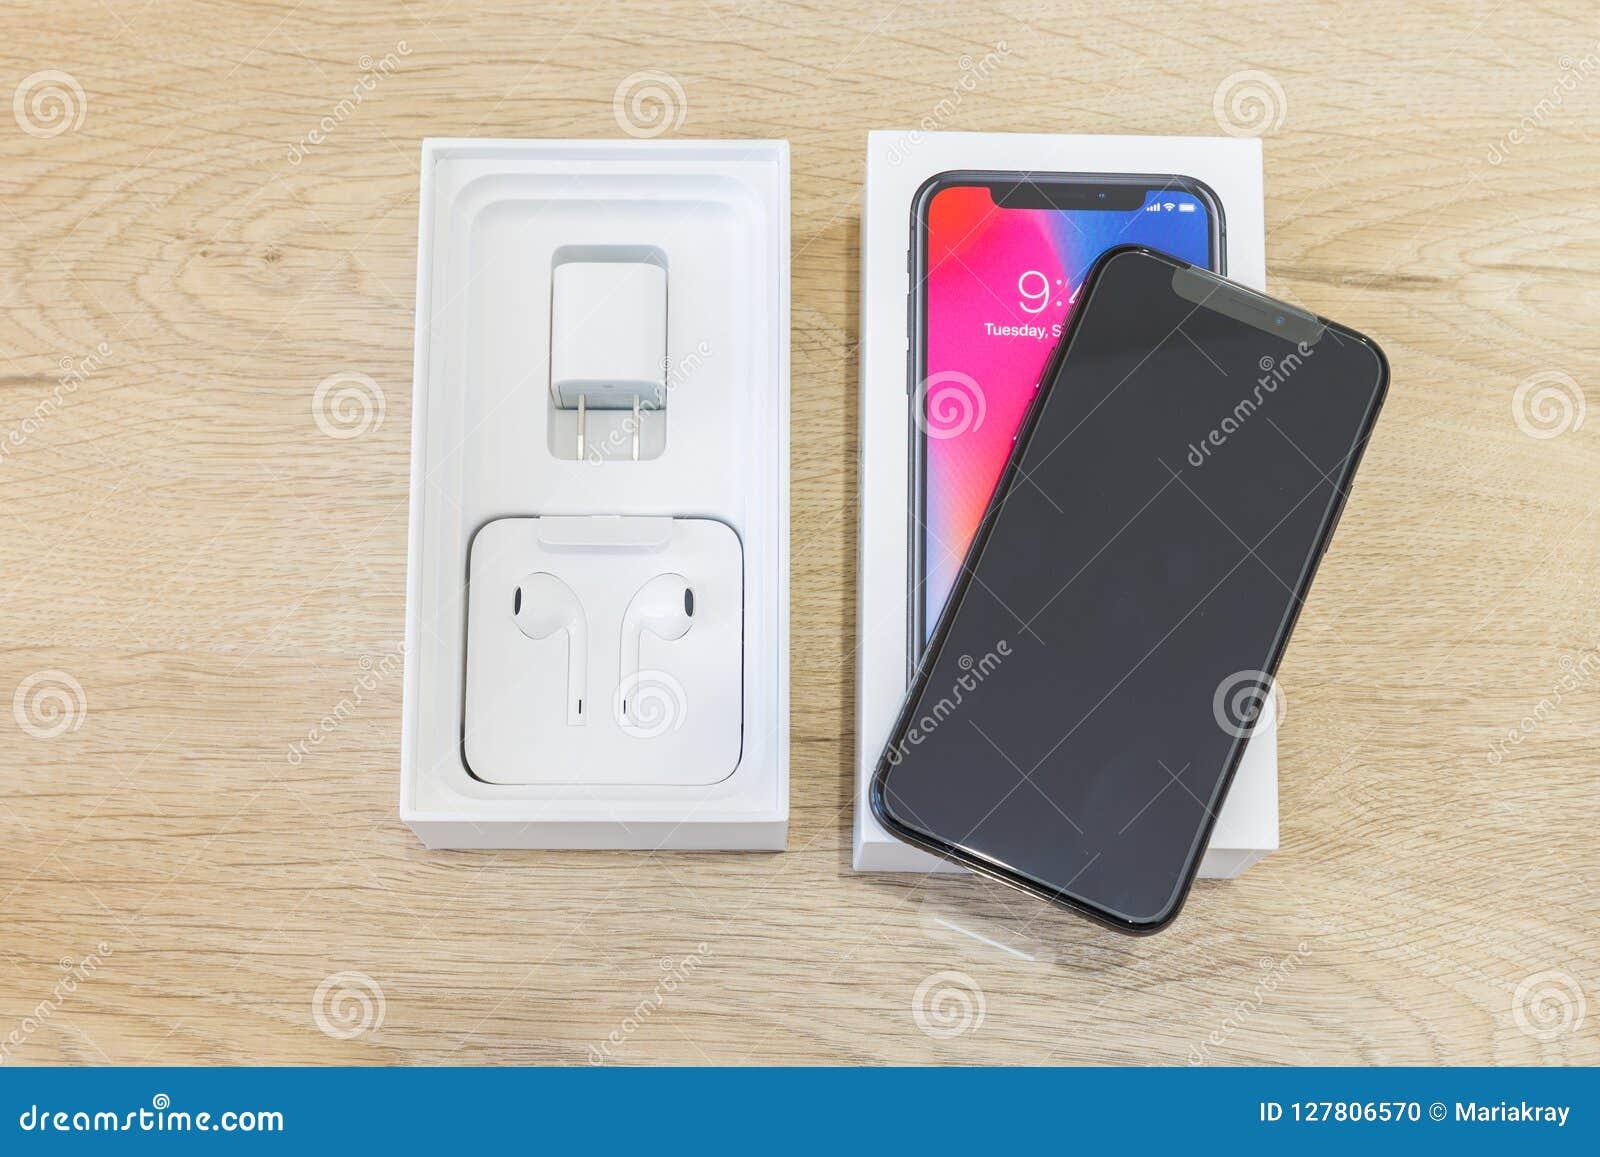 iphone 12 buy in Russia